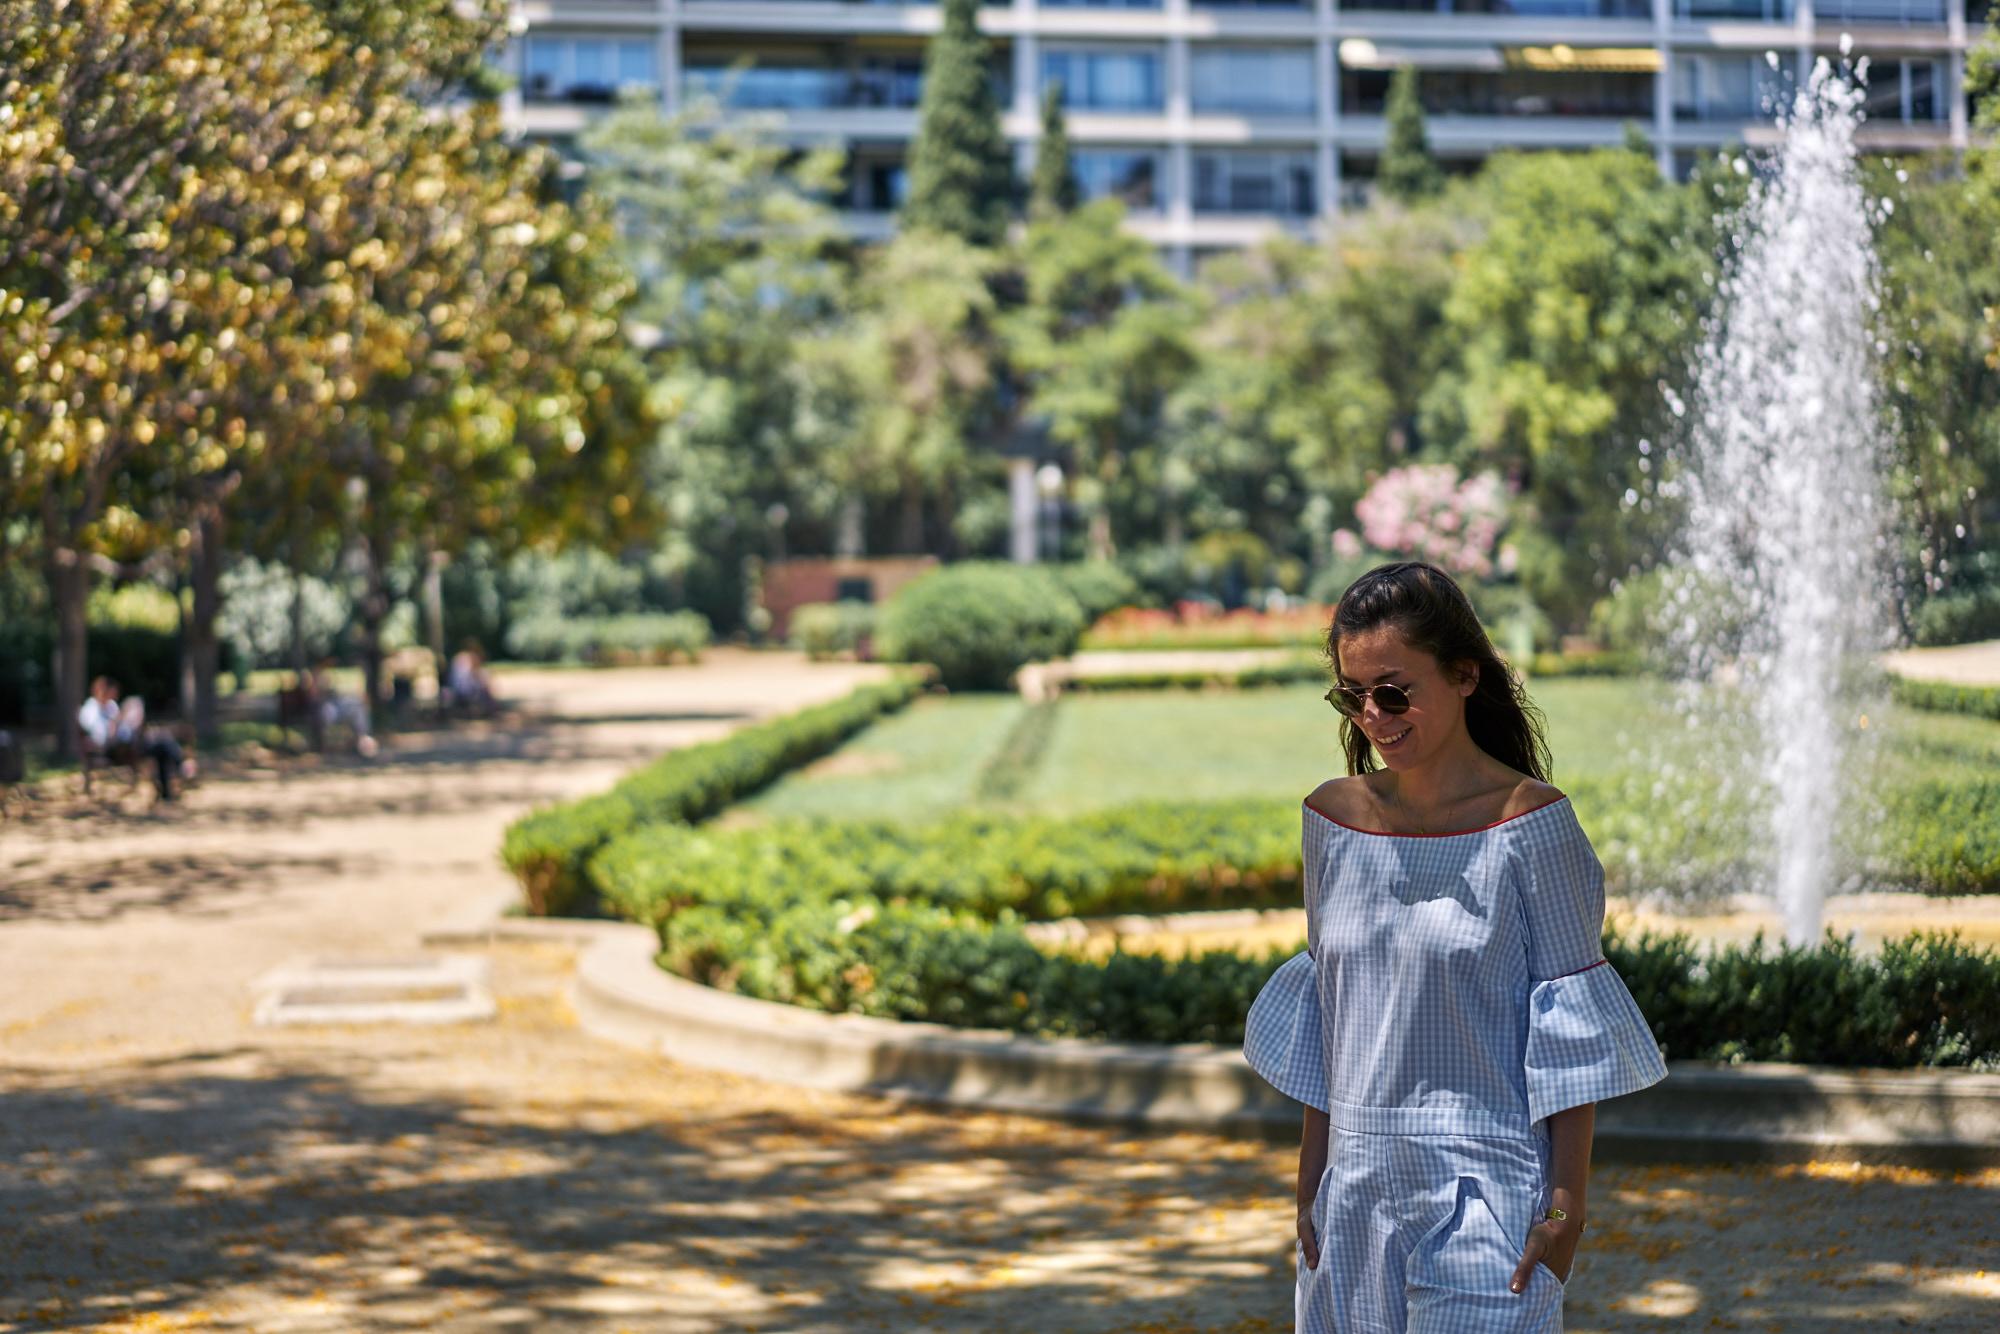 billur saatci, offnegiysem, street style, turkish style blogger, pia brand, pia, jumpsuit, barcelona, turo park,